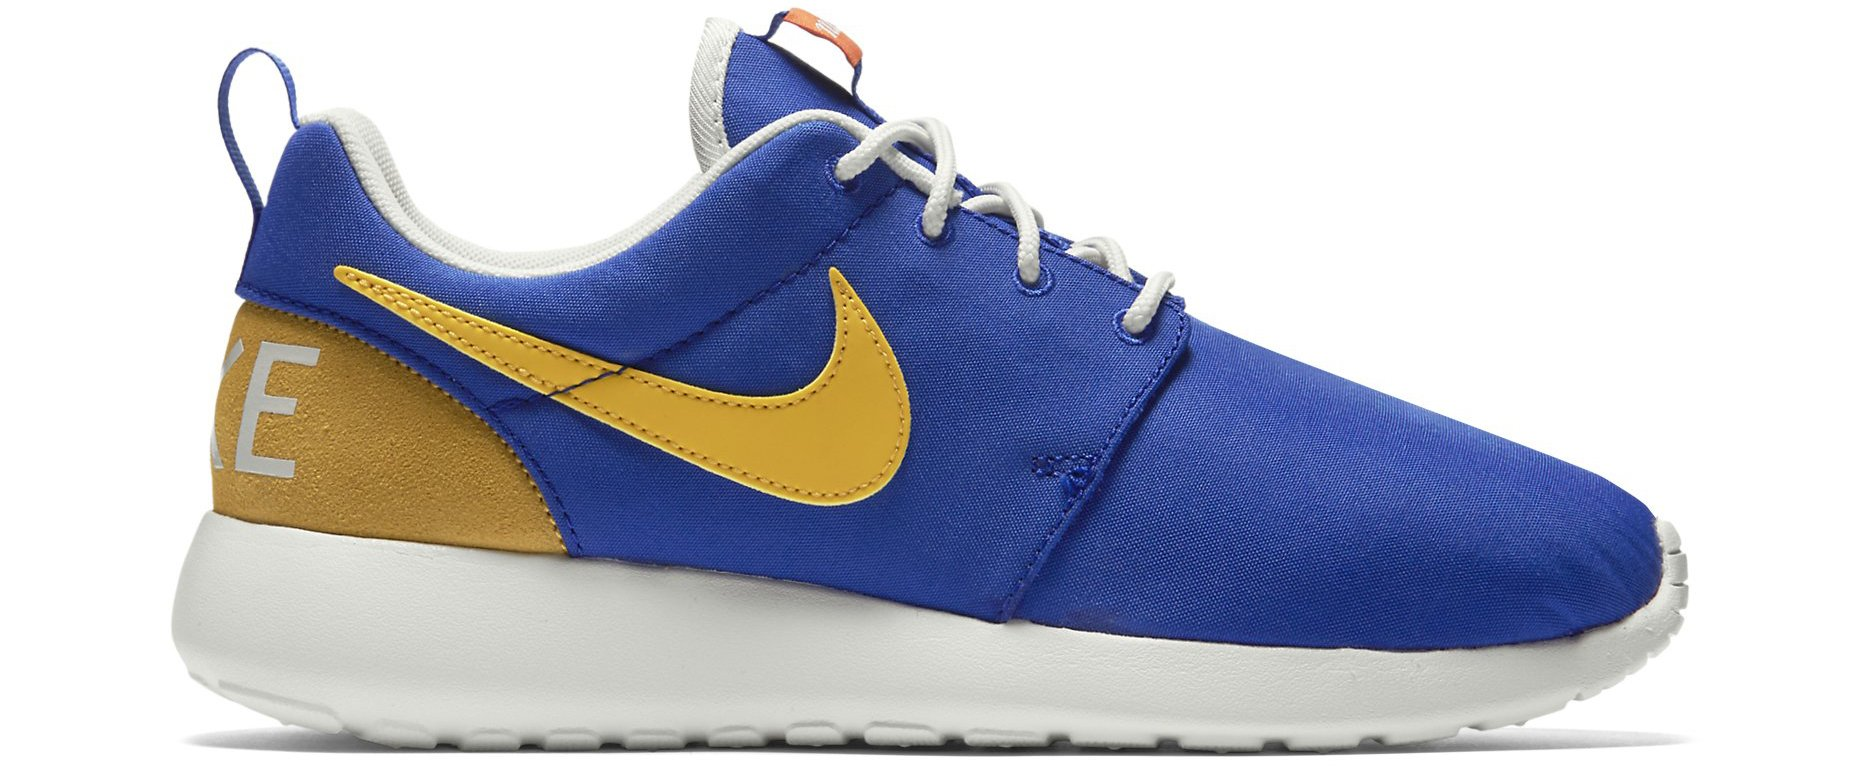 Obuv Nike WMNS ROSHE ONE RETRO